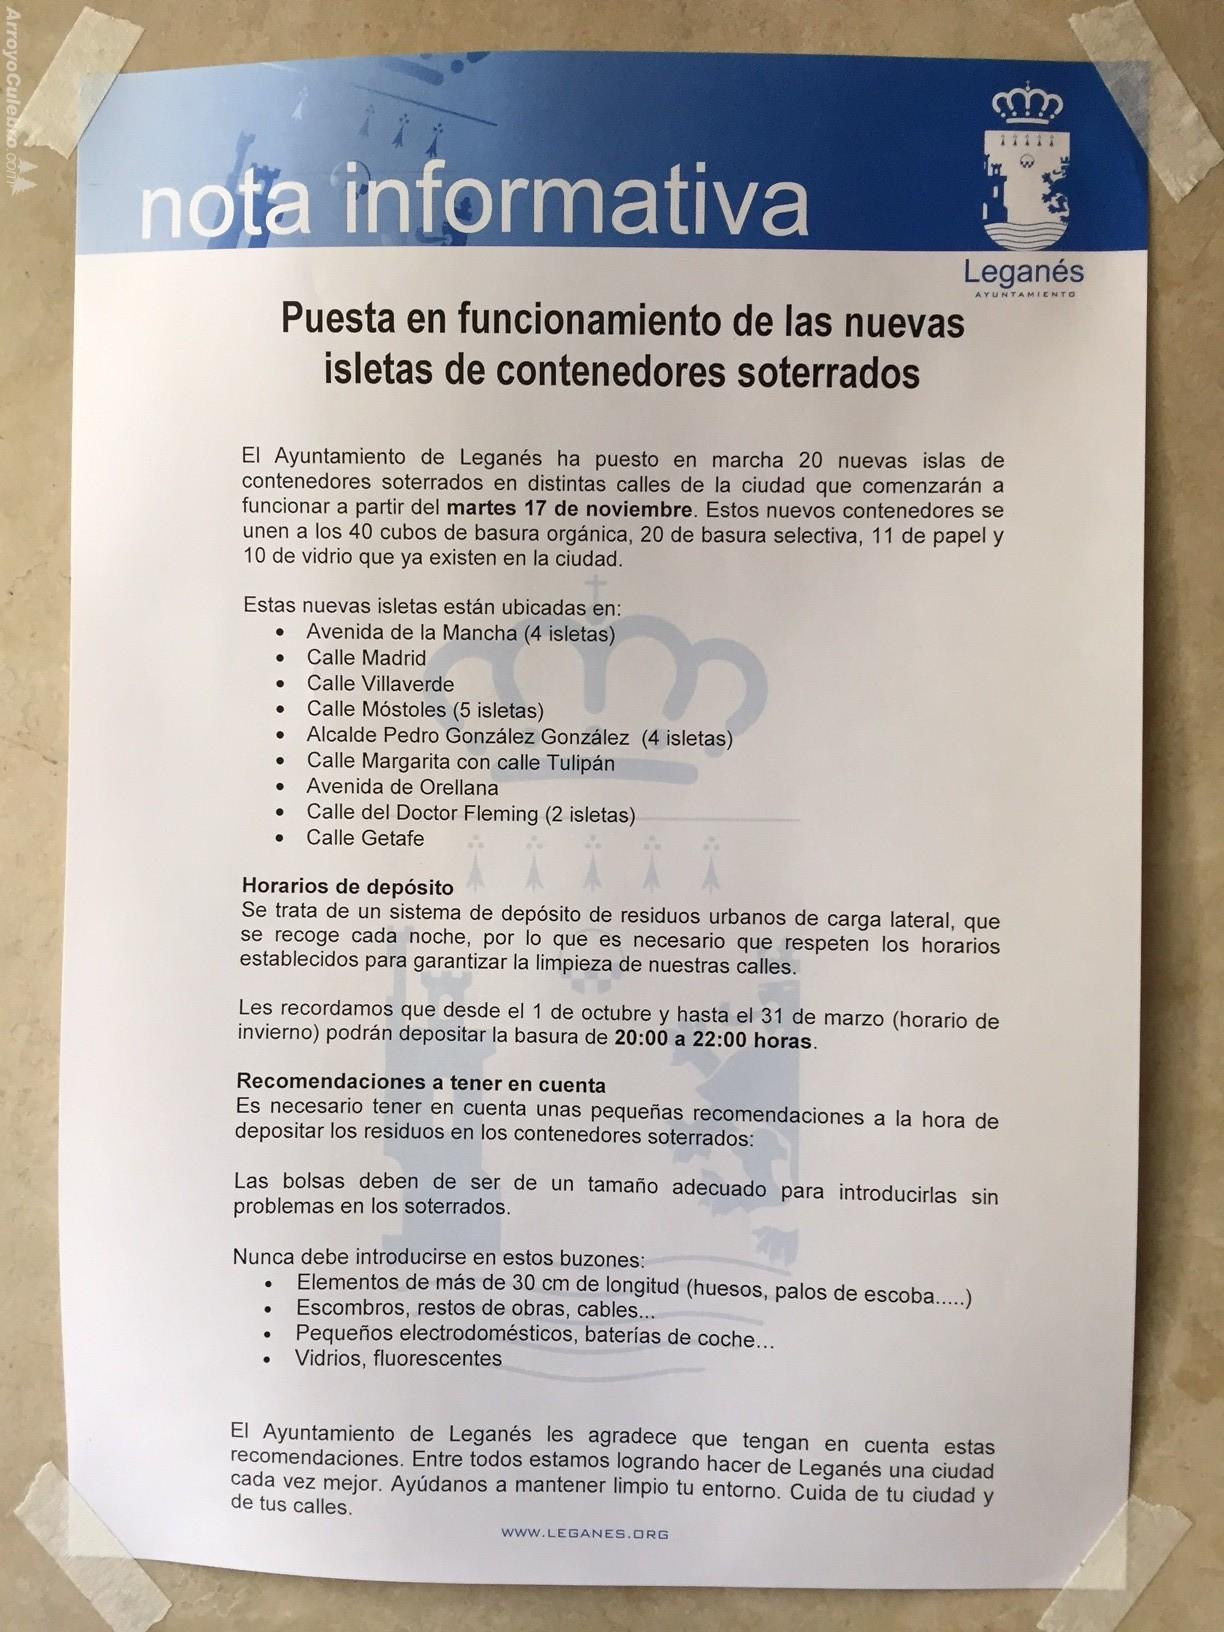 nota-informativa-contenedores-soterrados_leganes